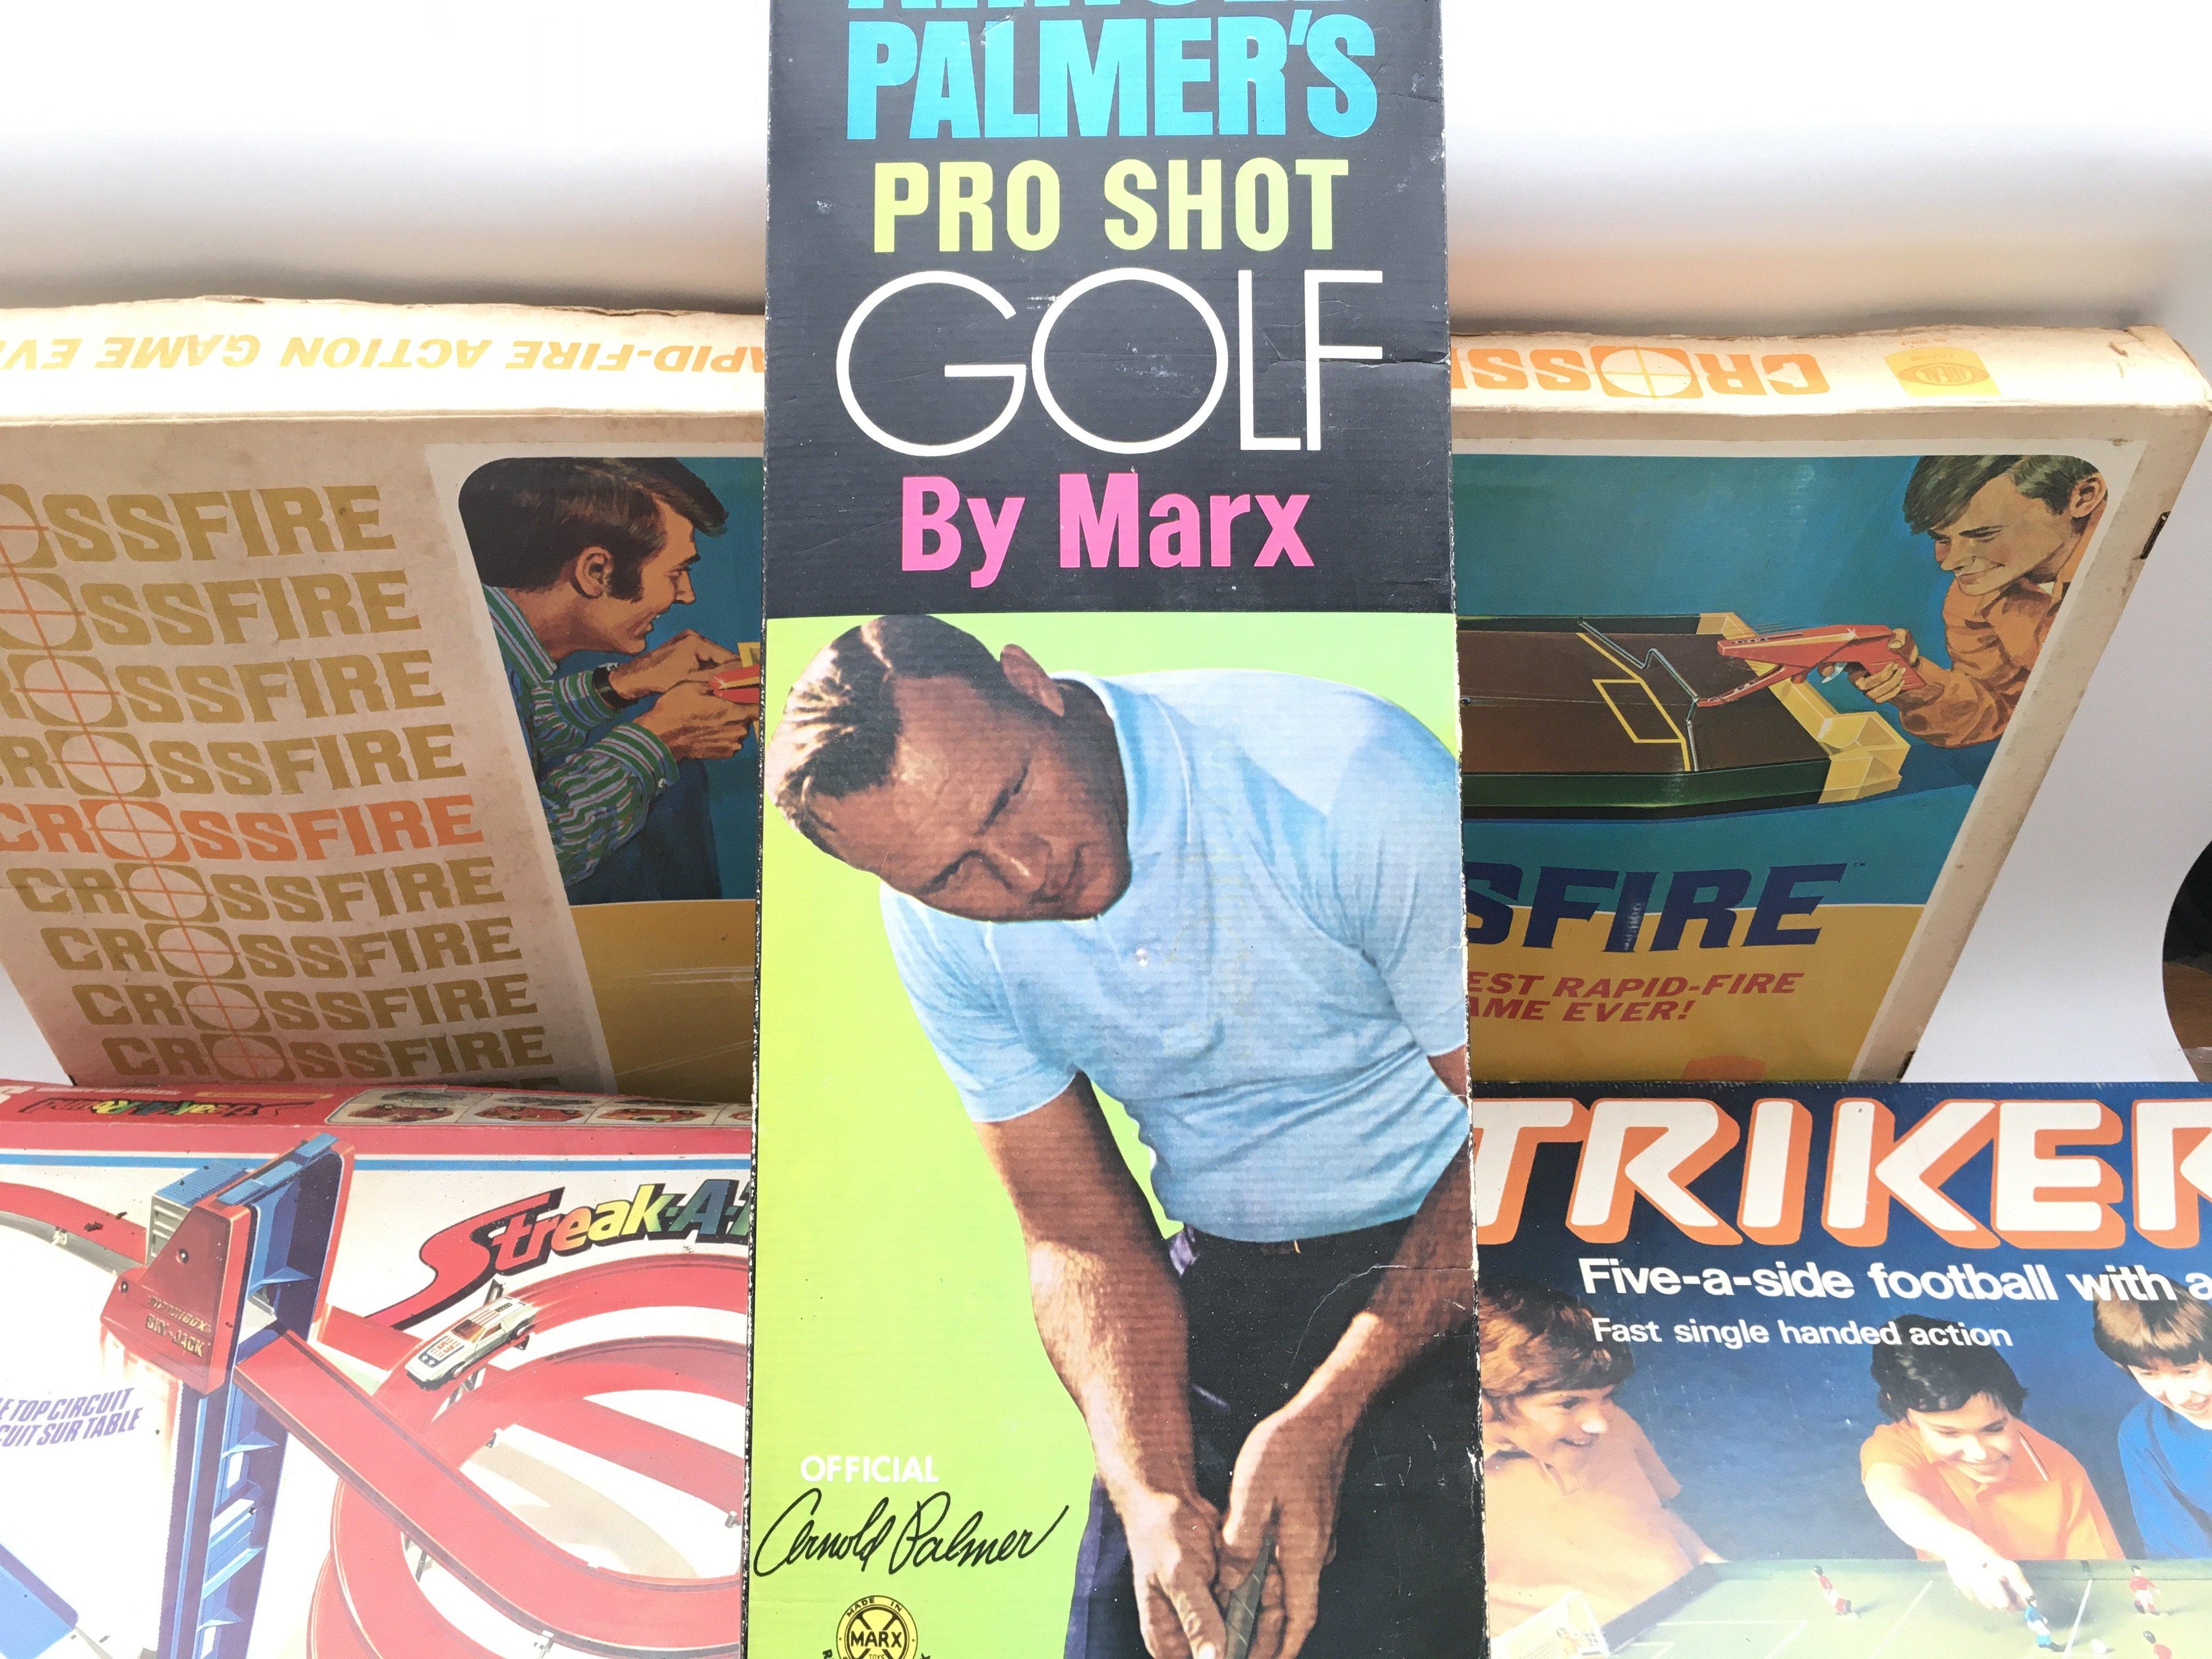 Collection of games including Matchbox. Striker. Arnold Palmer pro golf shot. Crossfire. - Image 5 of 9